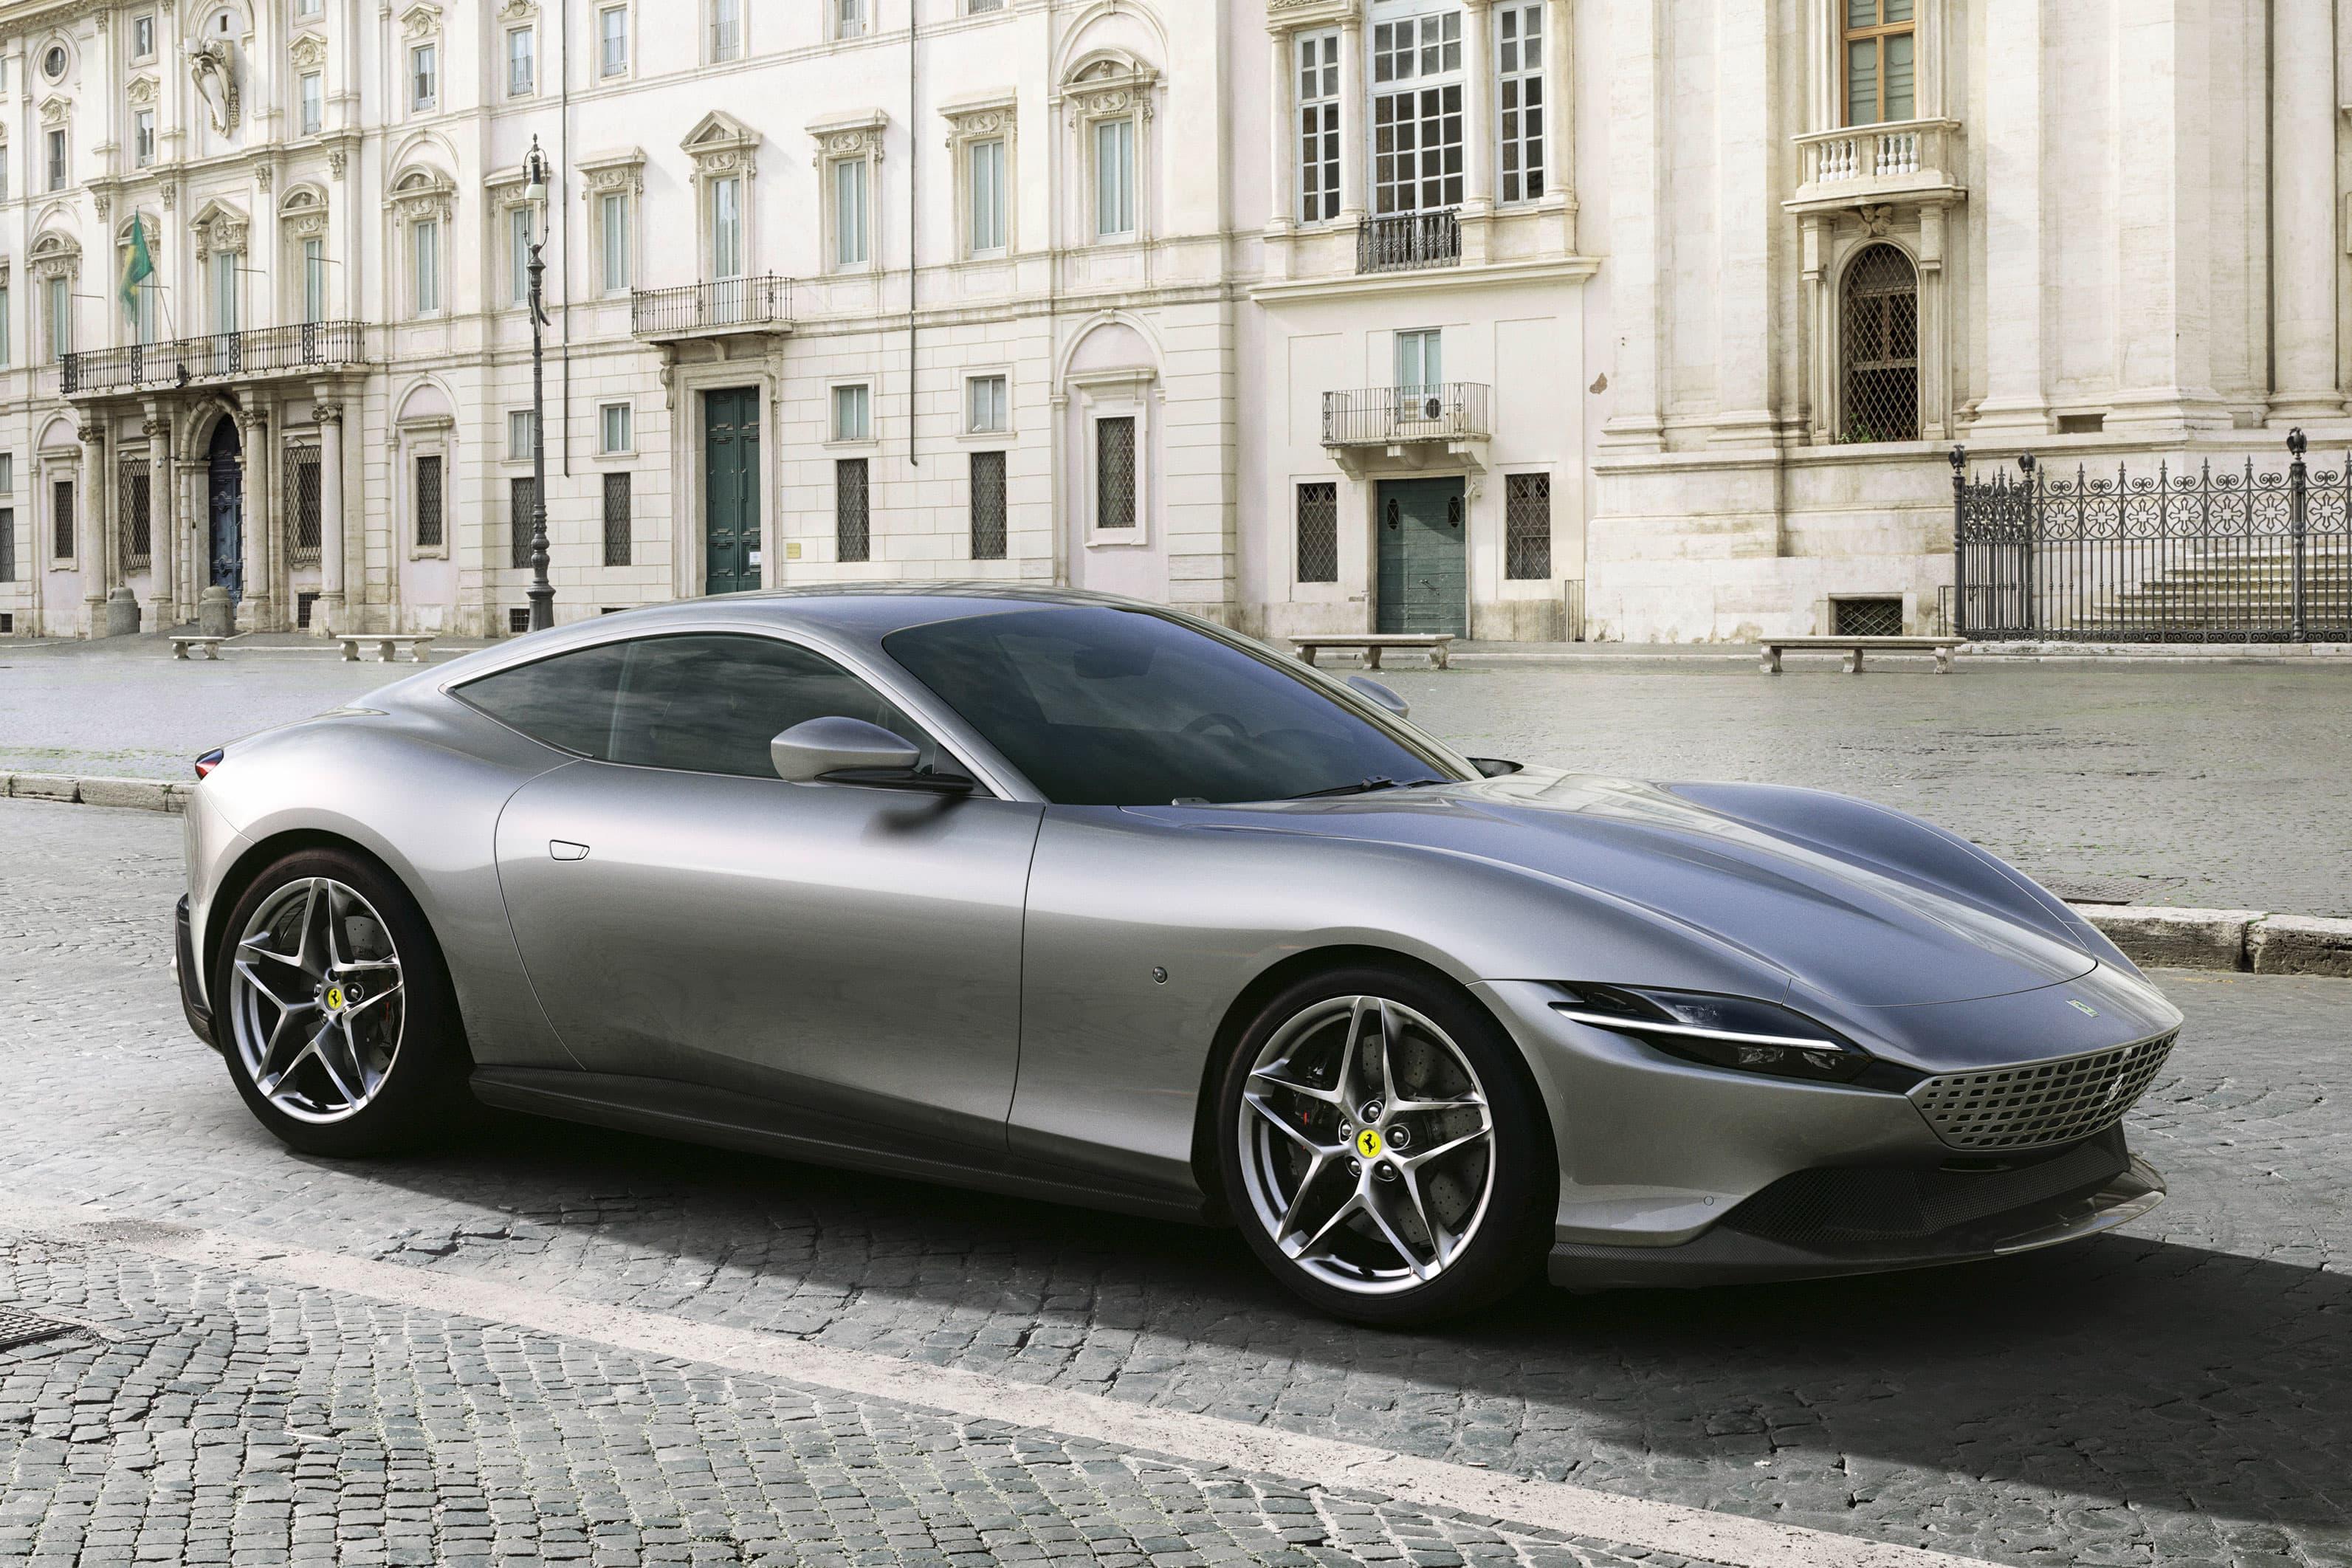 Ferrari unveils new 600,horsepower \u0027Roma\u0027 model